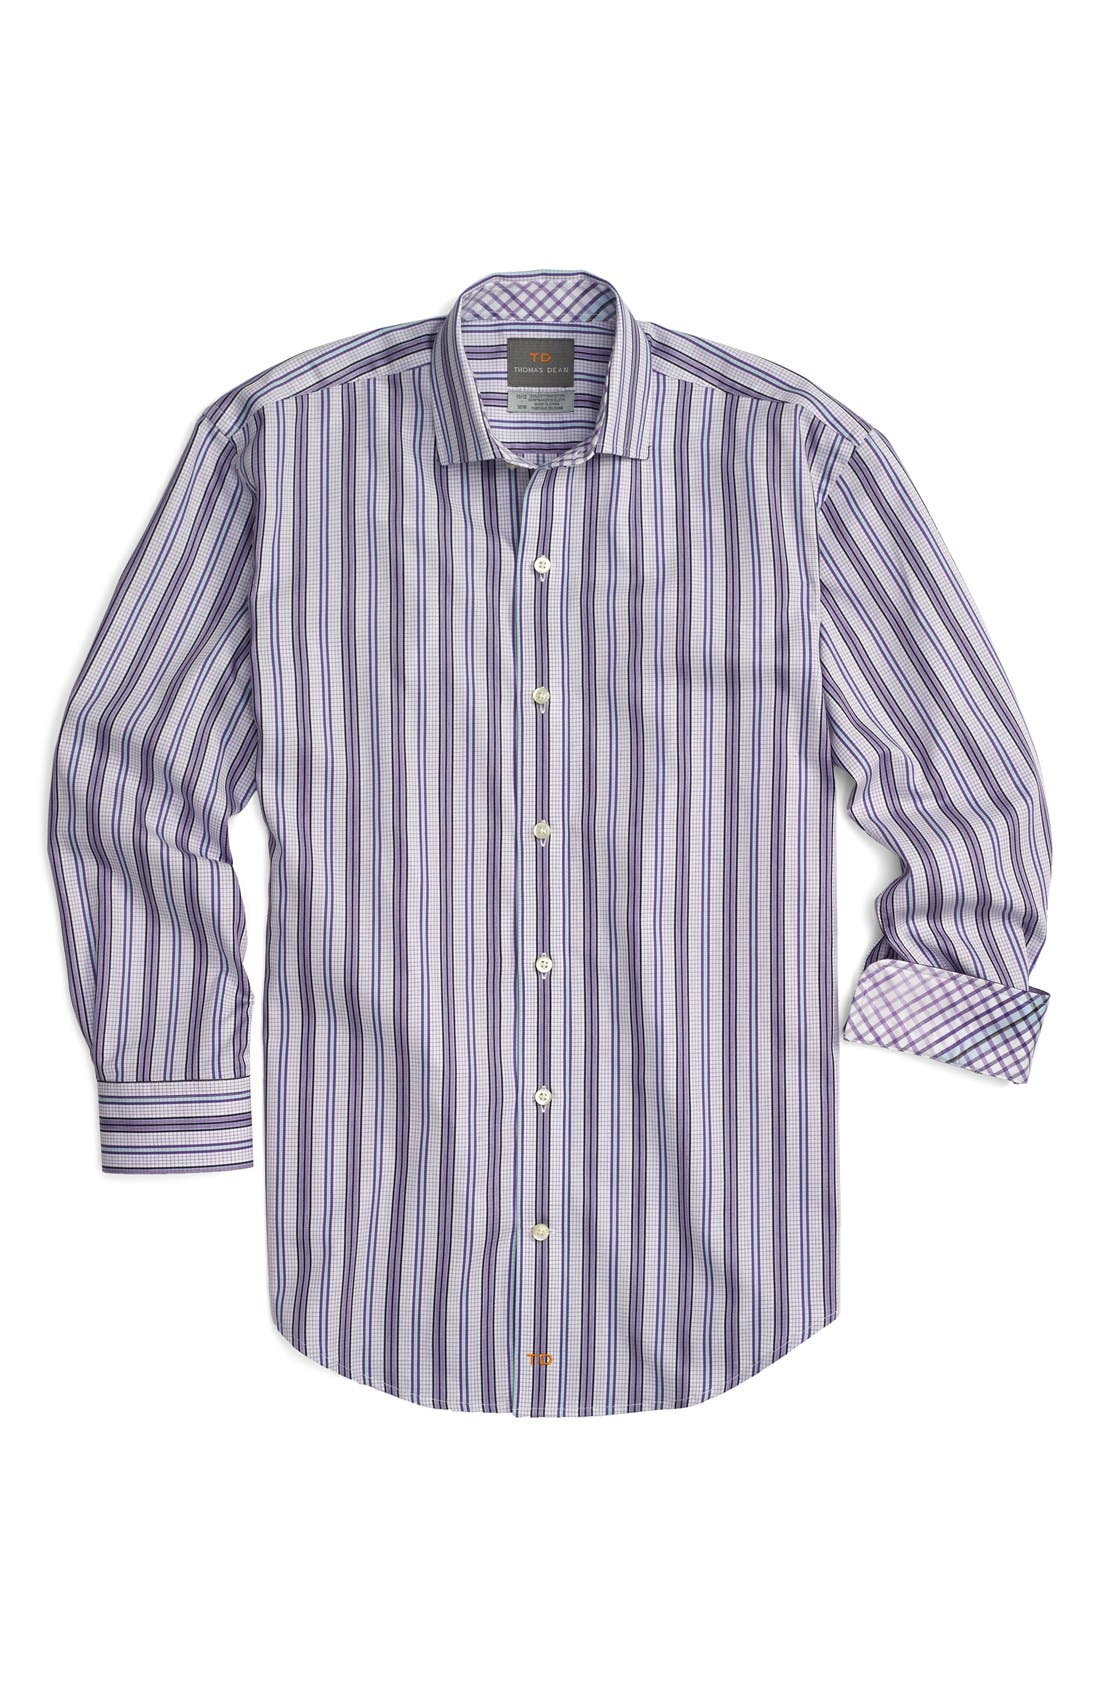 Main Image - Thomas Dean Stripe Cotton Poplin Dress Shirt (Little Boys)